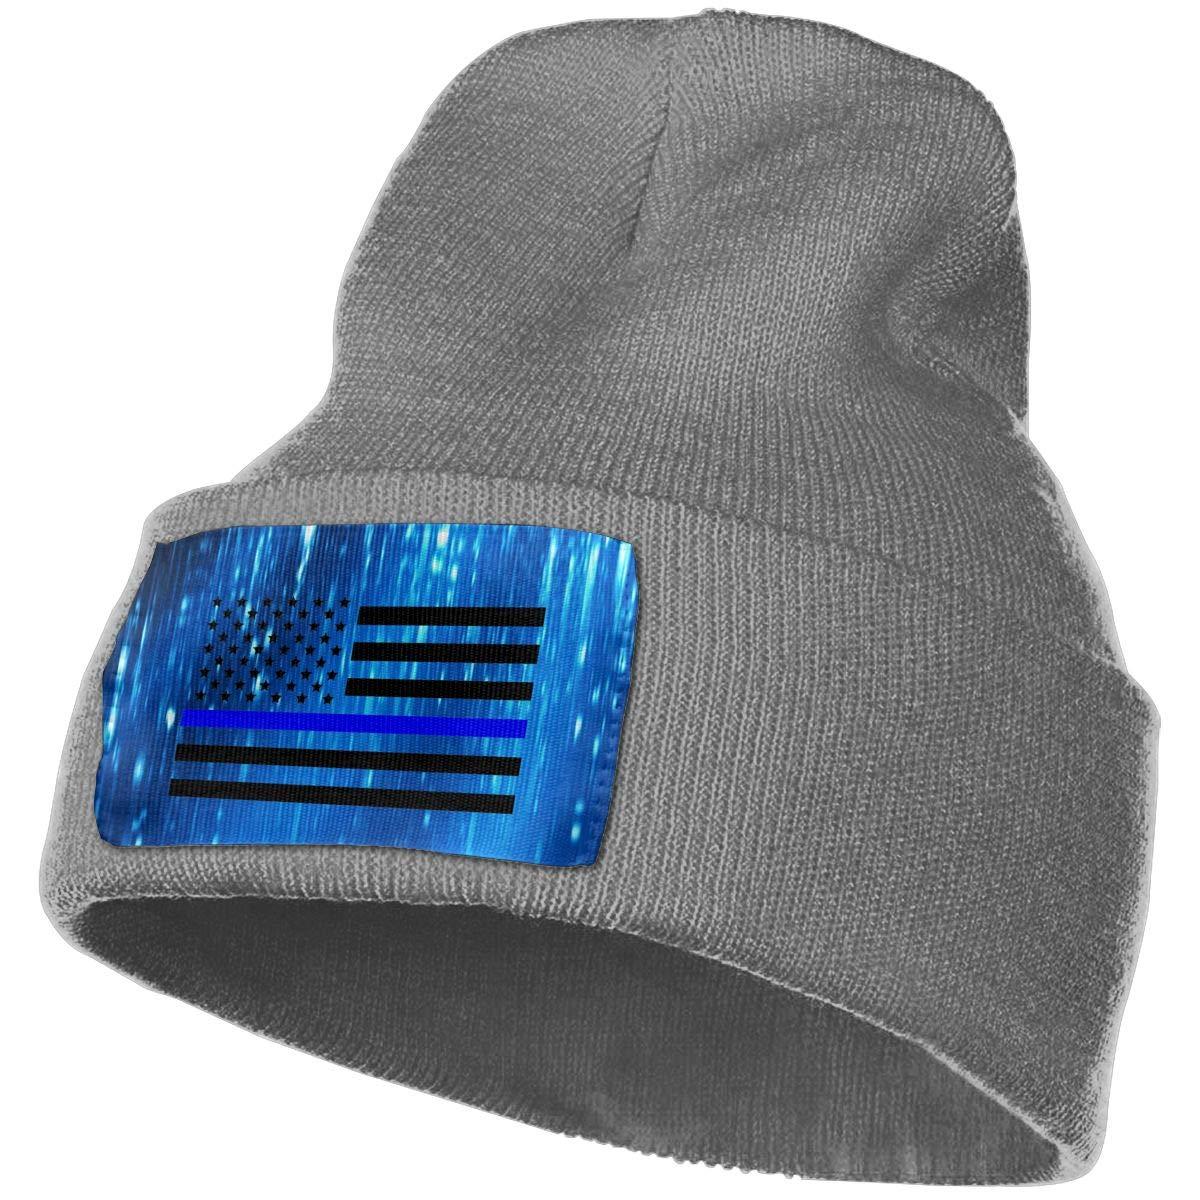 Helidoud Thin Blue Line USA Flag Winter Beanie Hat Knit Hat Cap for for Men /& Women